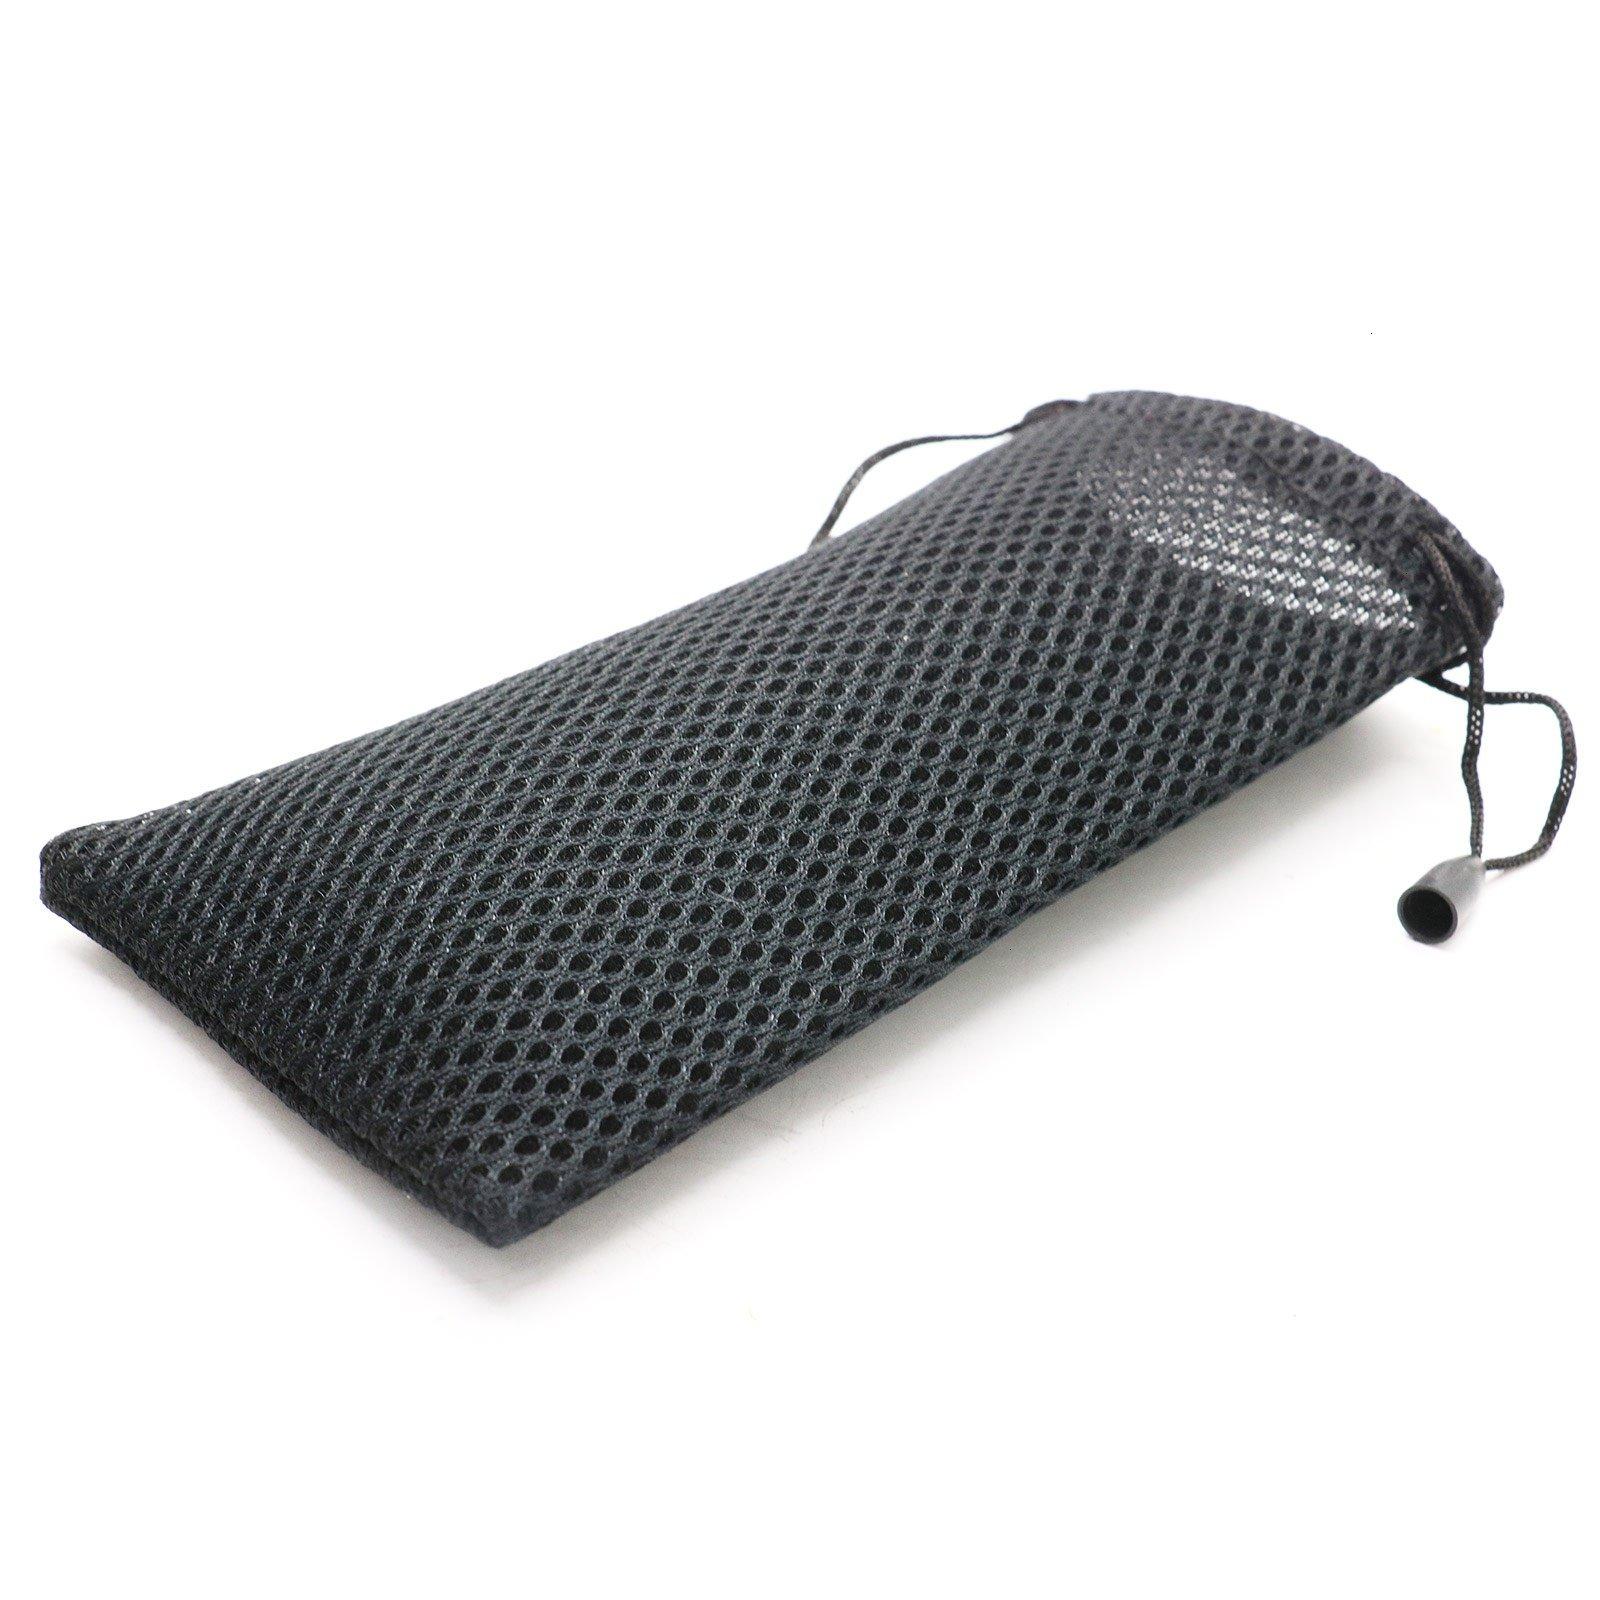 MAISHO 20pcs Nylon Mesh Drawstring Bag Pouches for Sunglasses Cellphone Mp3